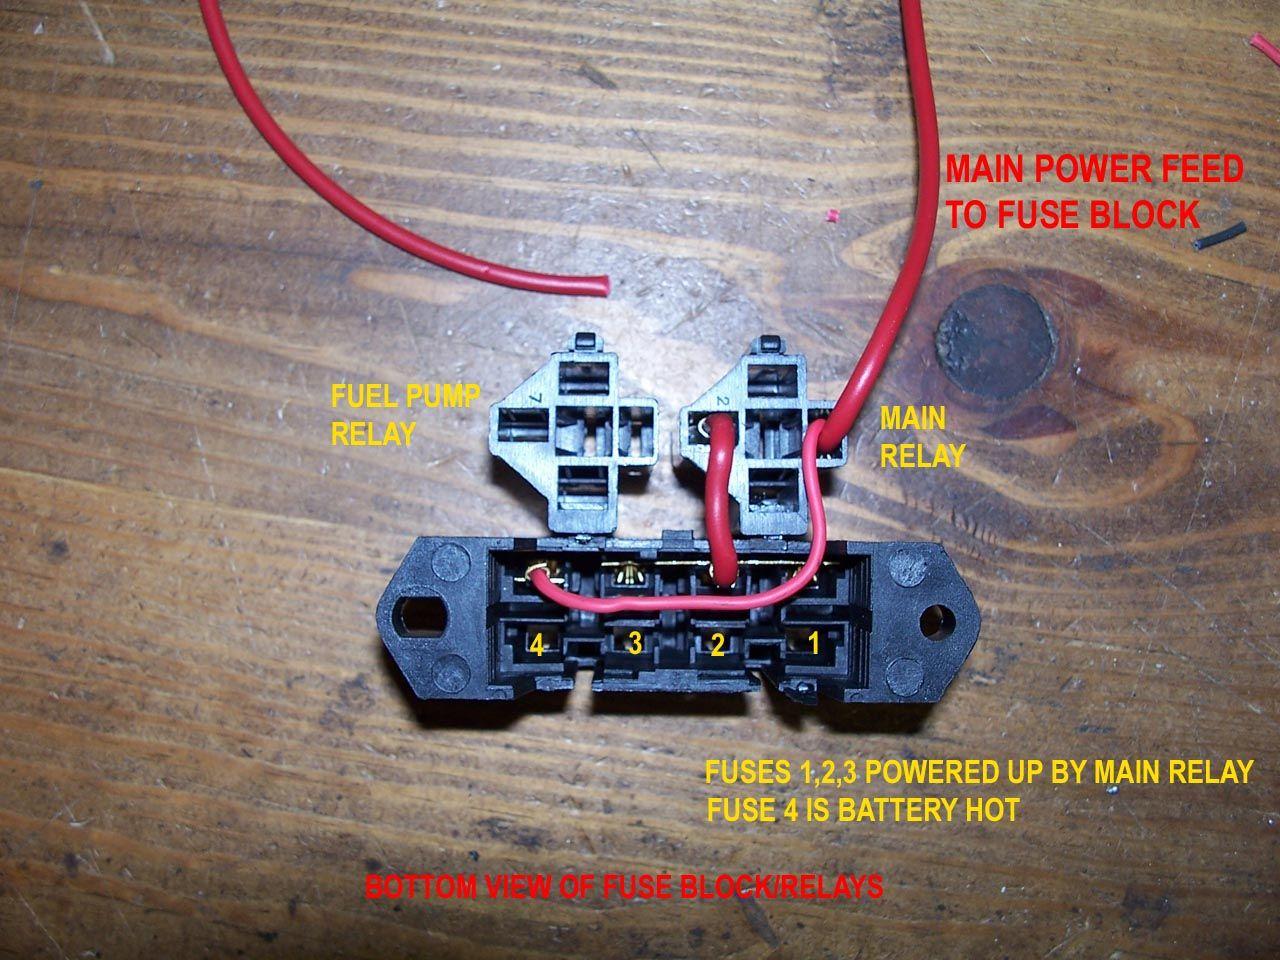 vortec 4 8 5 3 6 0 wiring harness info [ 1280 x 960 Pixel ]